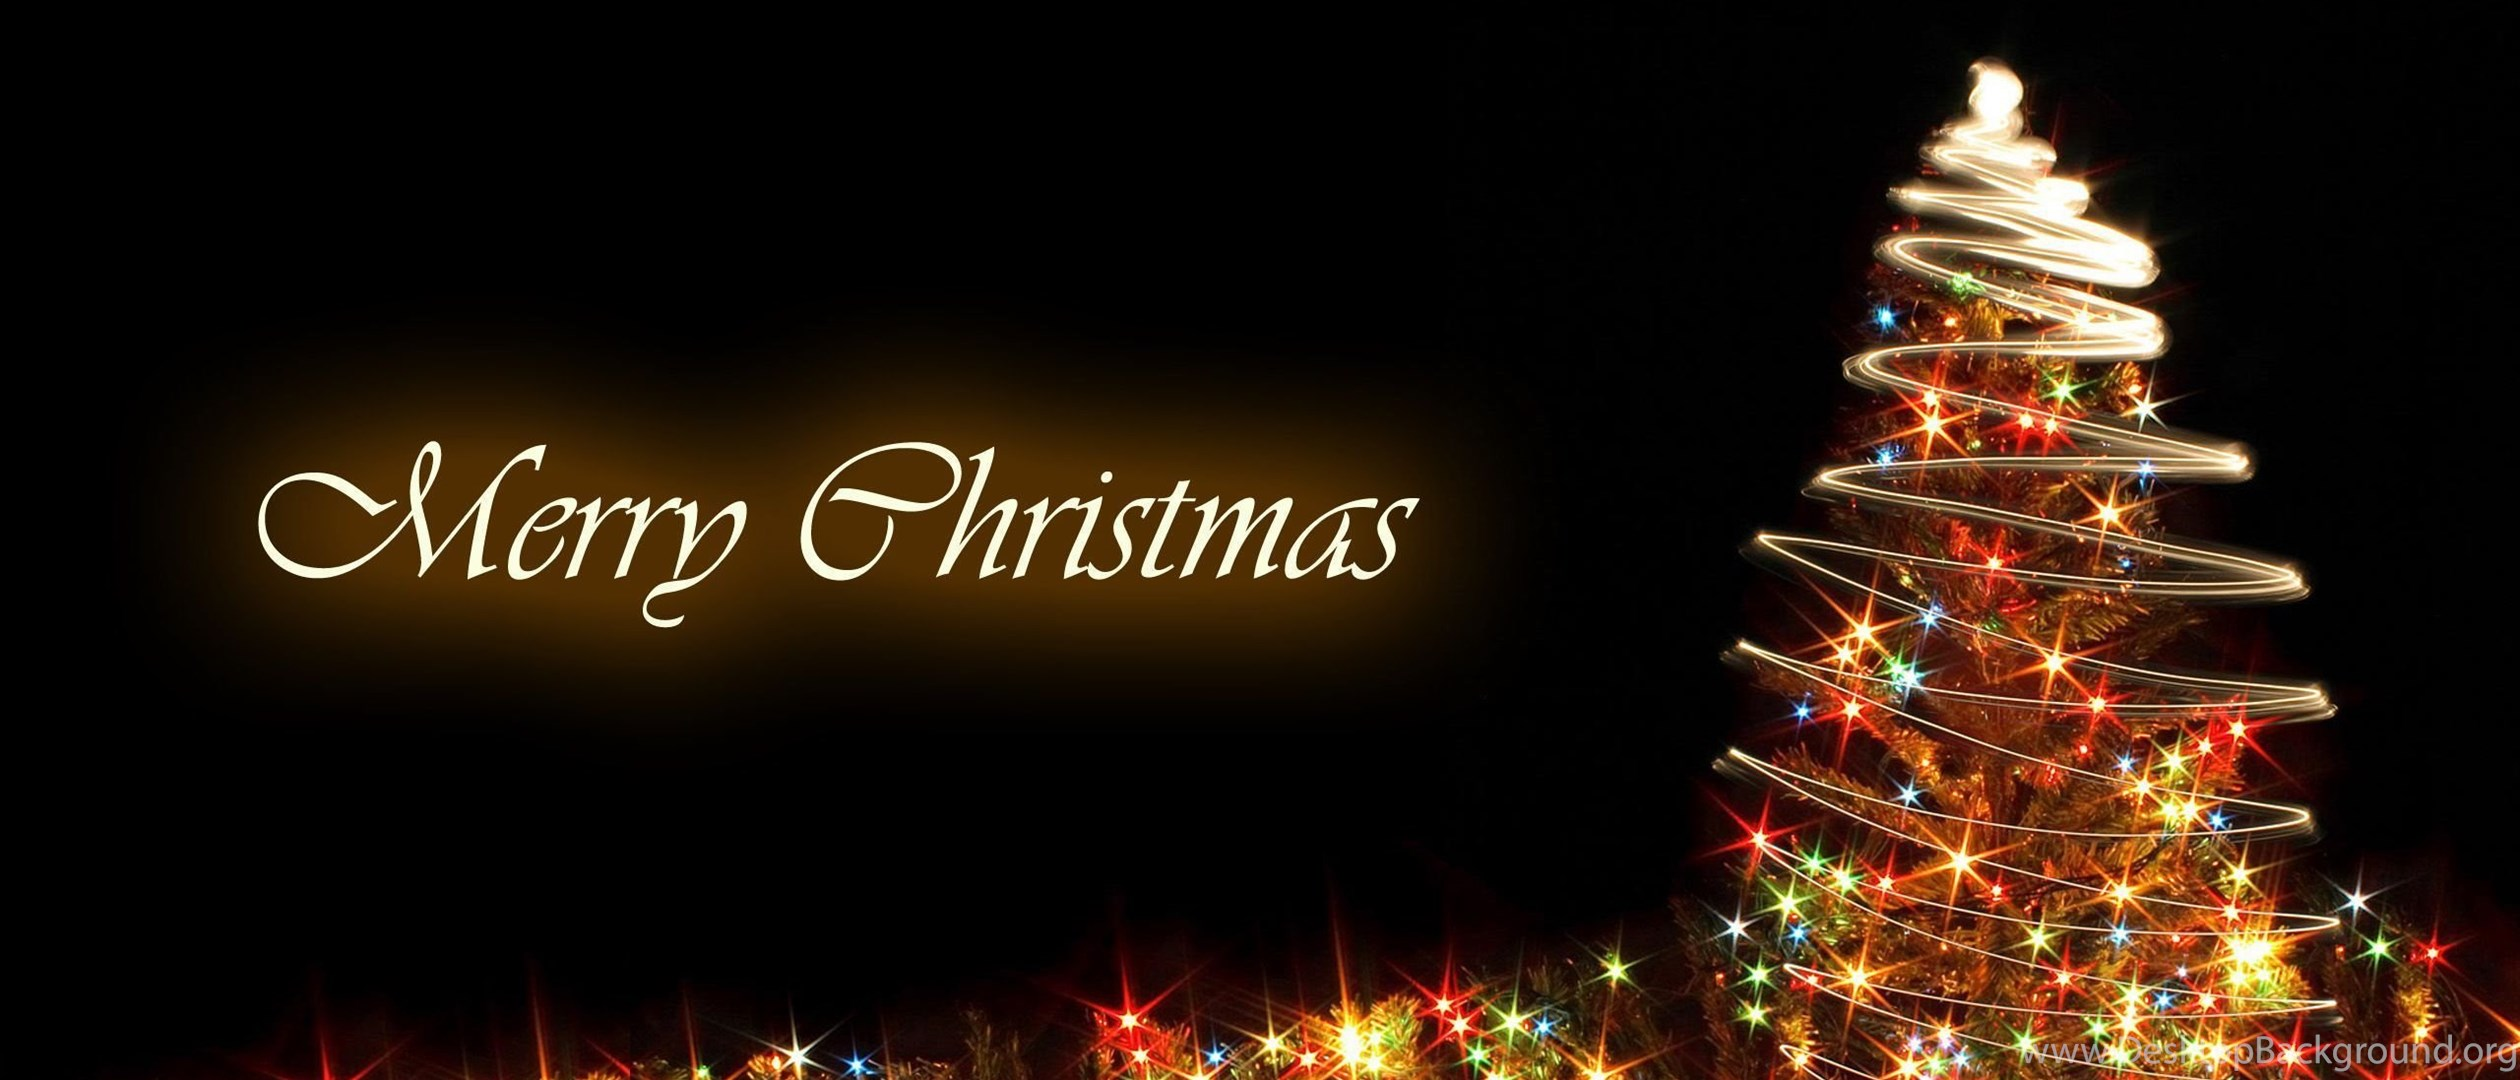 Merry Christmas Wallpaper Christmas Desktop Wallpapers Hd